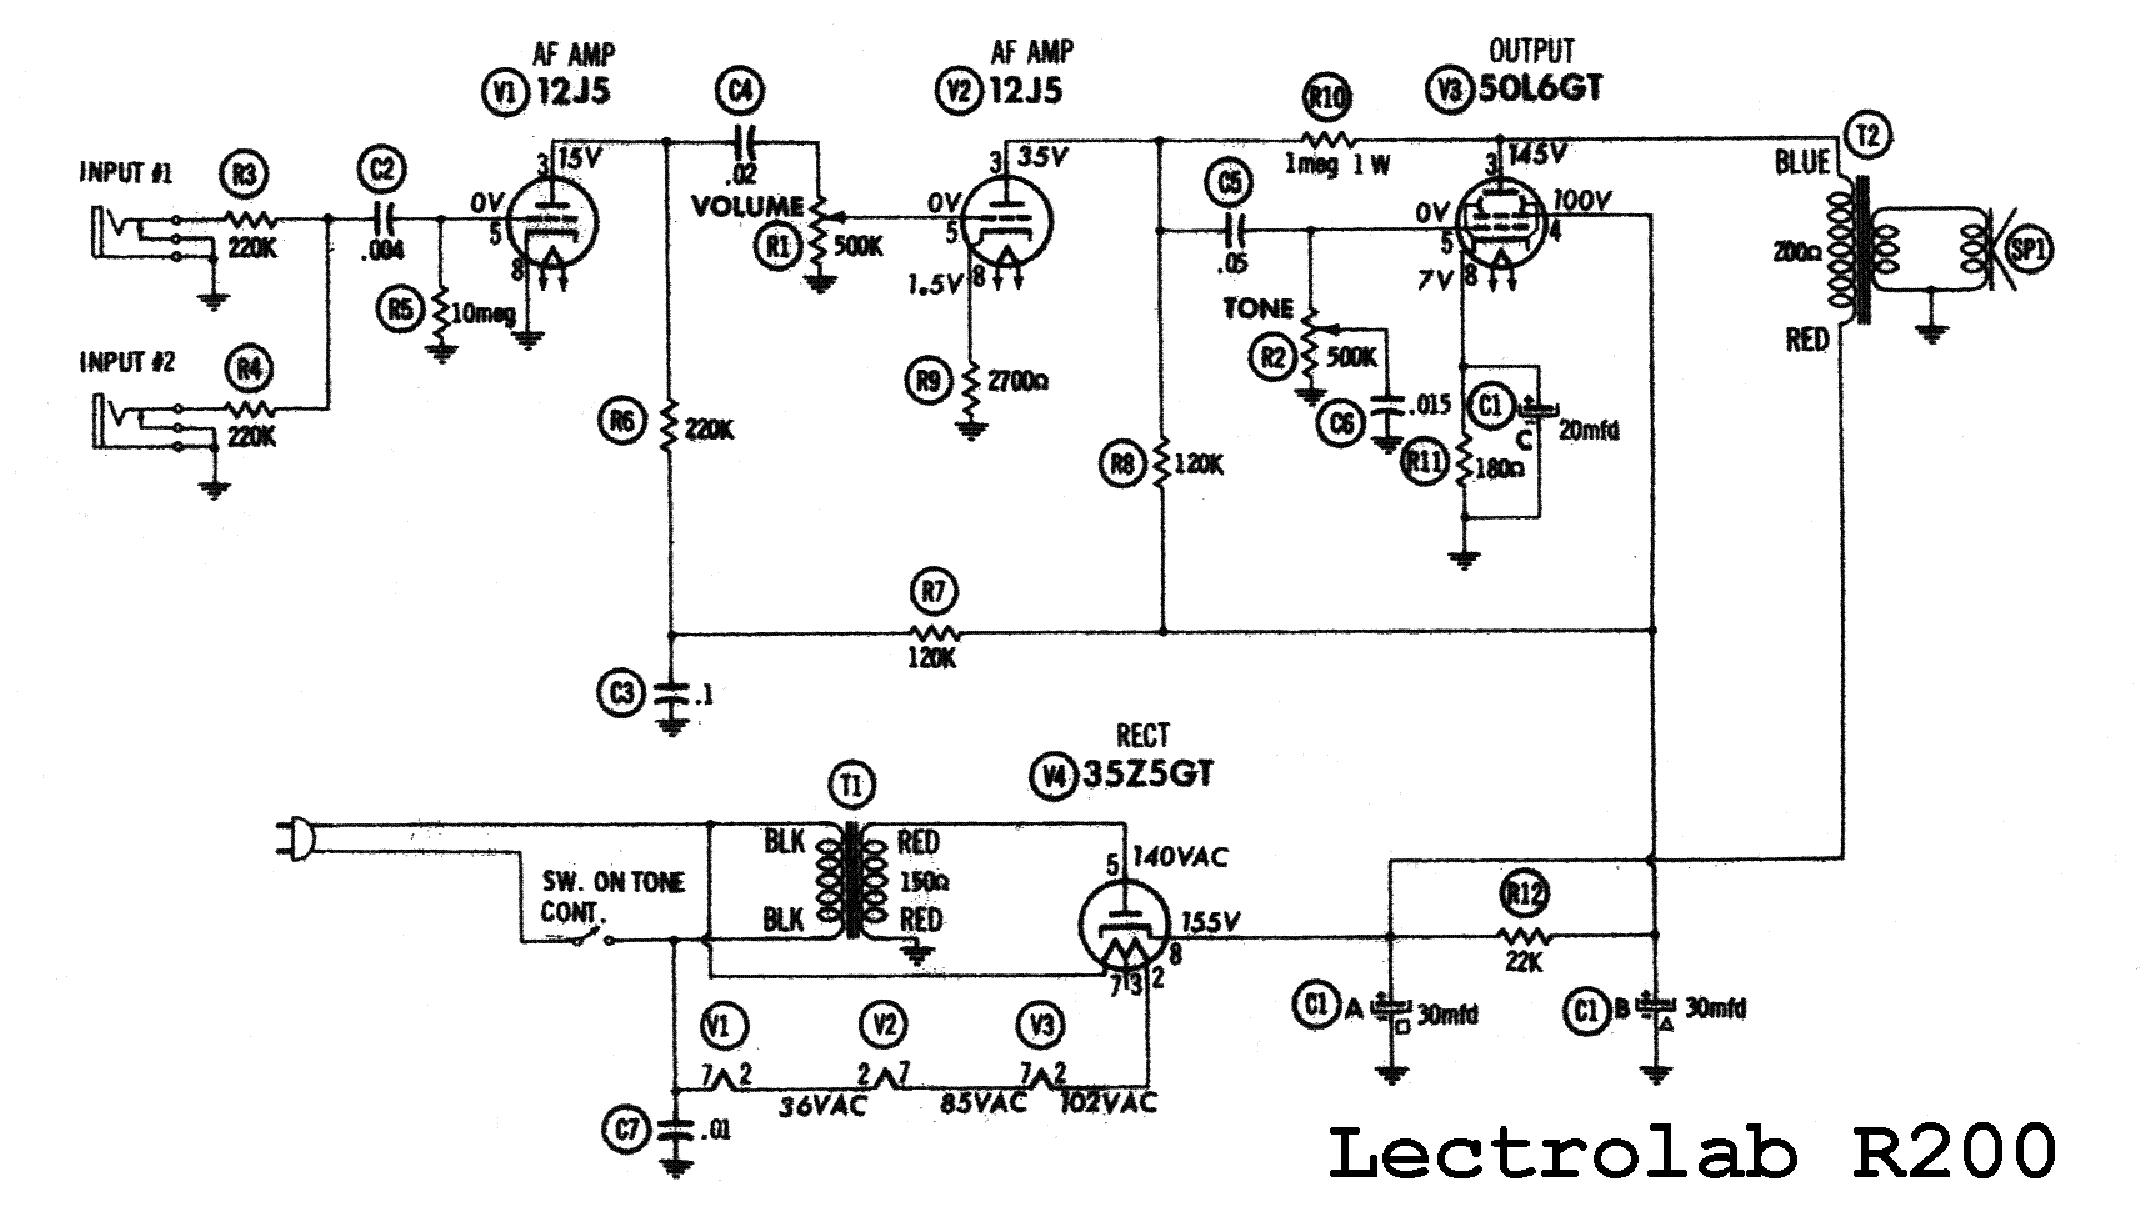 LECTROLAB R200 SCH Service Manual download, schematics, eeprom ...